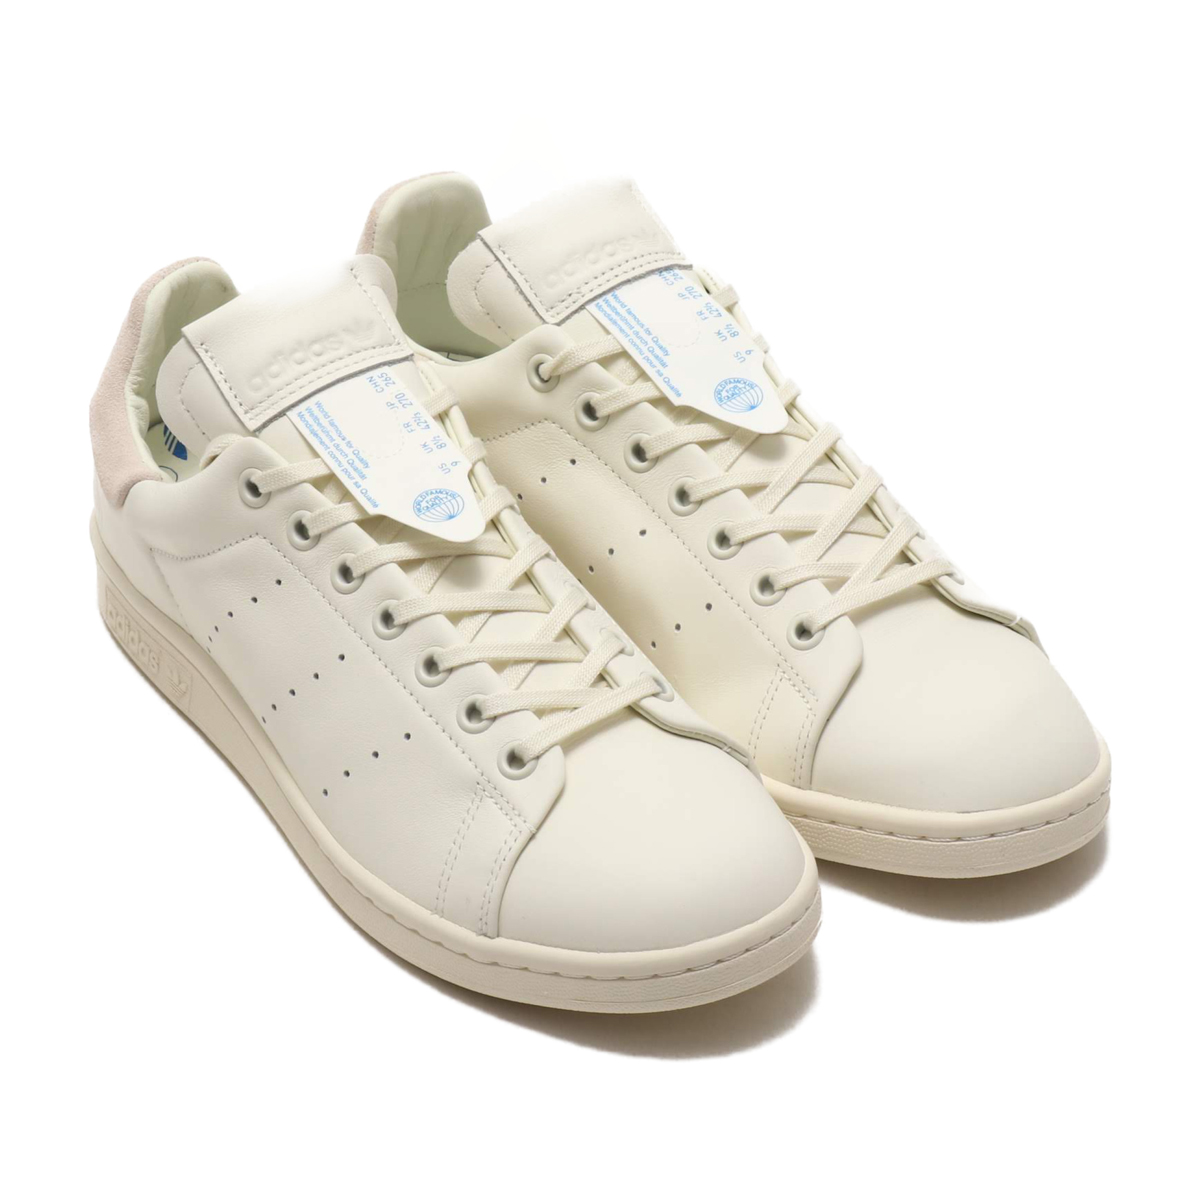 adidas STAN SMITH RECON(アディダス スタンスミス リーコン)OFF WHITE/OFF WHITE/OFF WHITE【メンズ レディース スニーカー】20SS-I